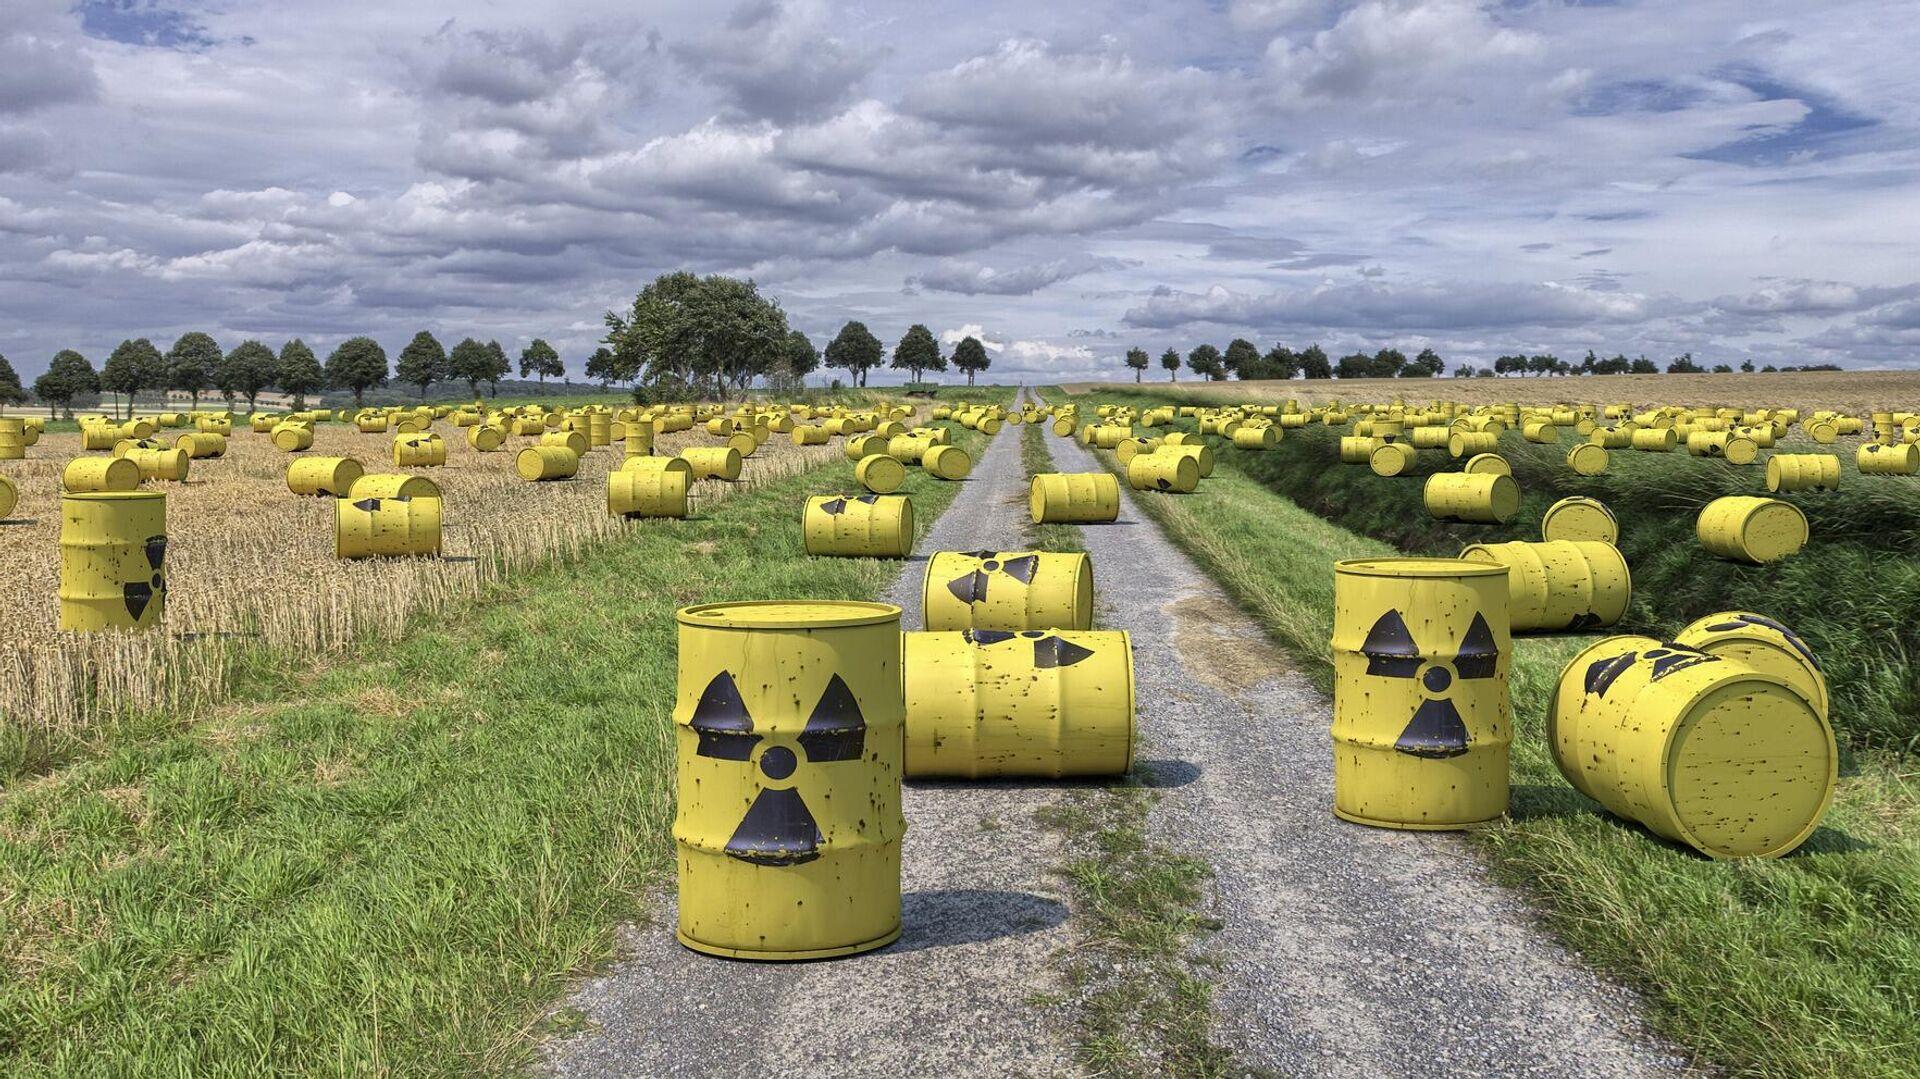 Residuos radioactivos (imagen referencial) - Sputnik Mundo, 1920, 06.07.2021